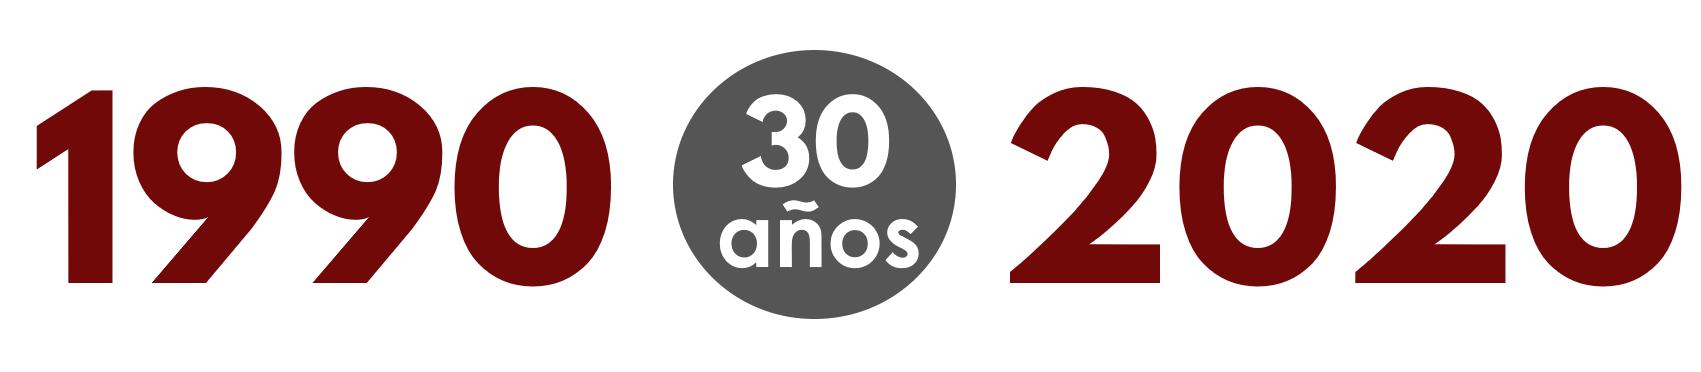 https://ortizbotellaabogados.es/wp-content/uploads/2020/01/LOGOGRWEB.png